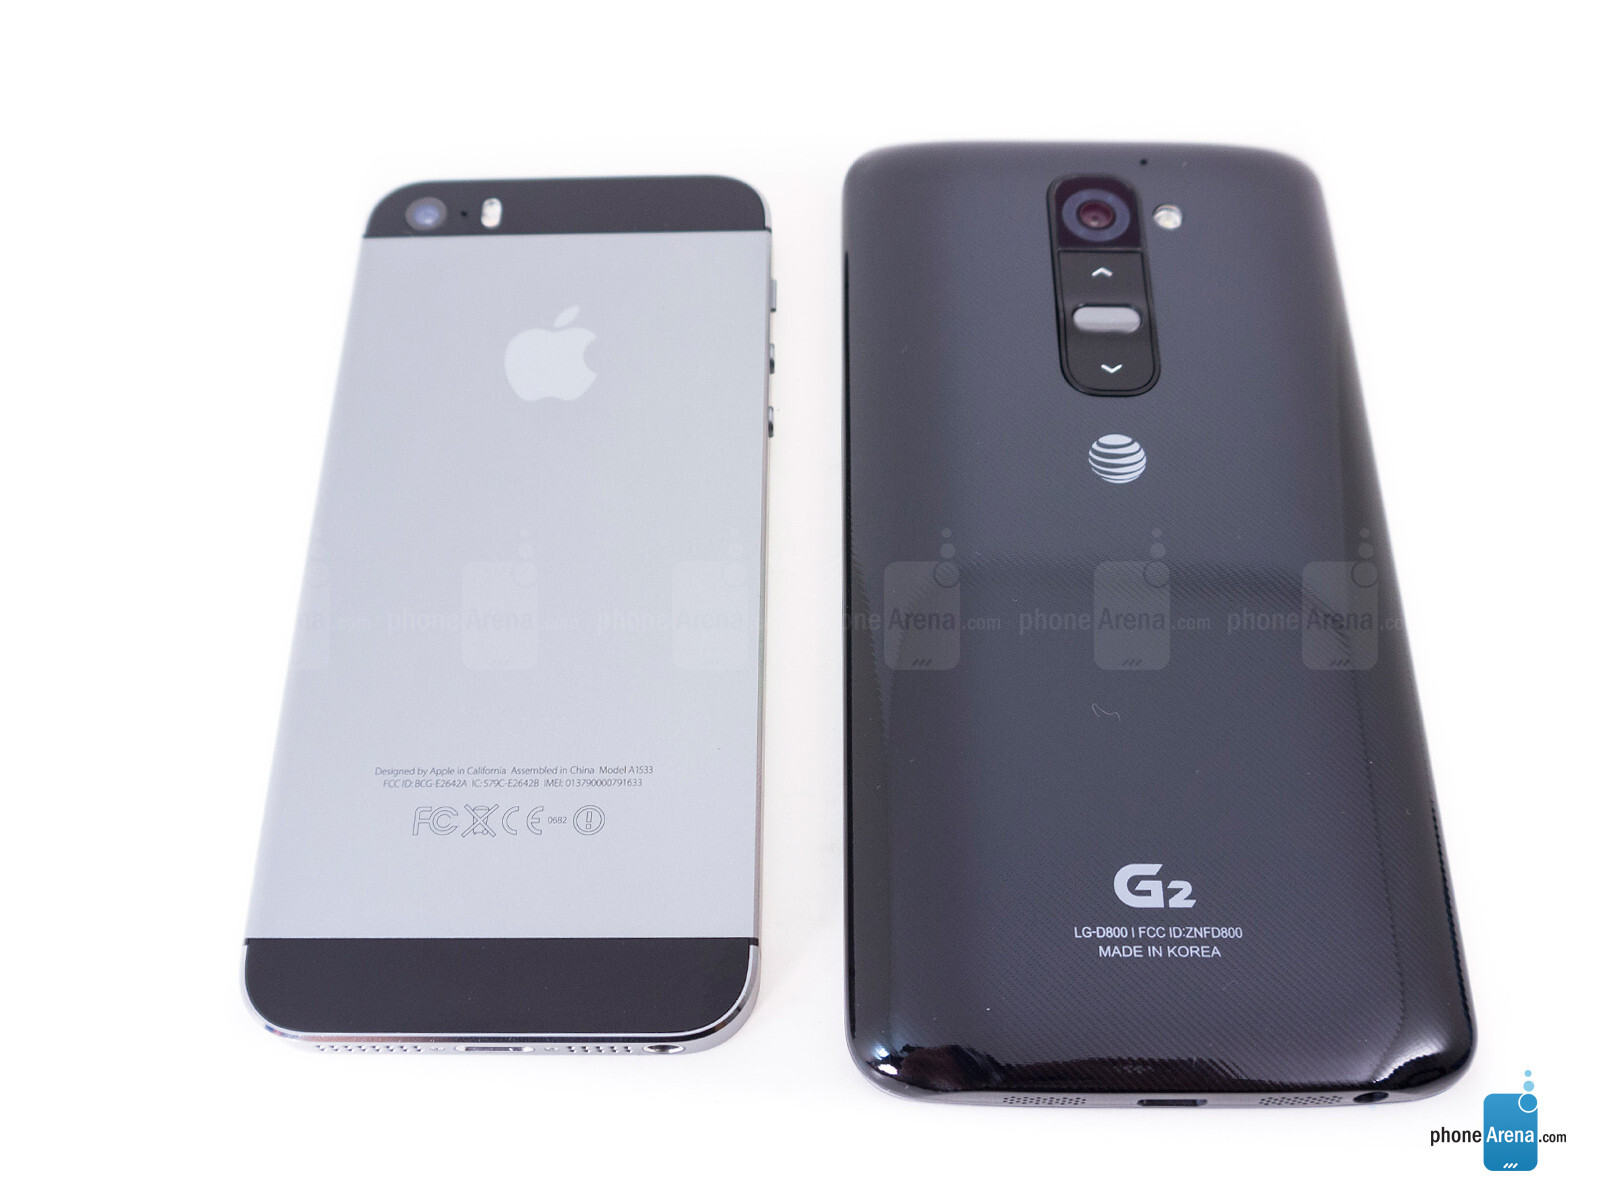 Apple iPhone 5s vs LG G2